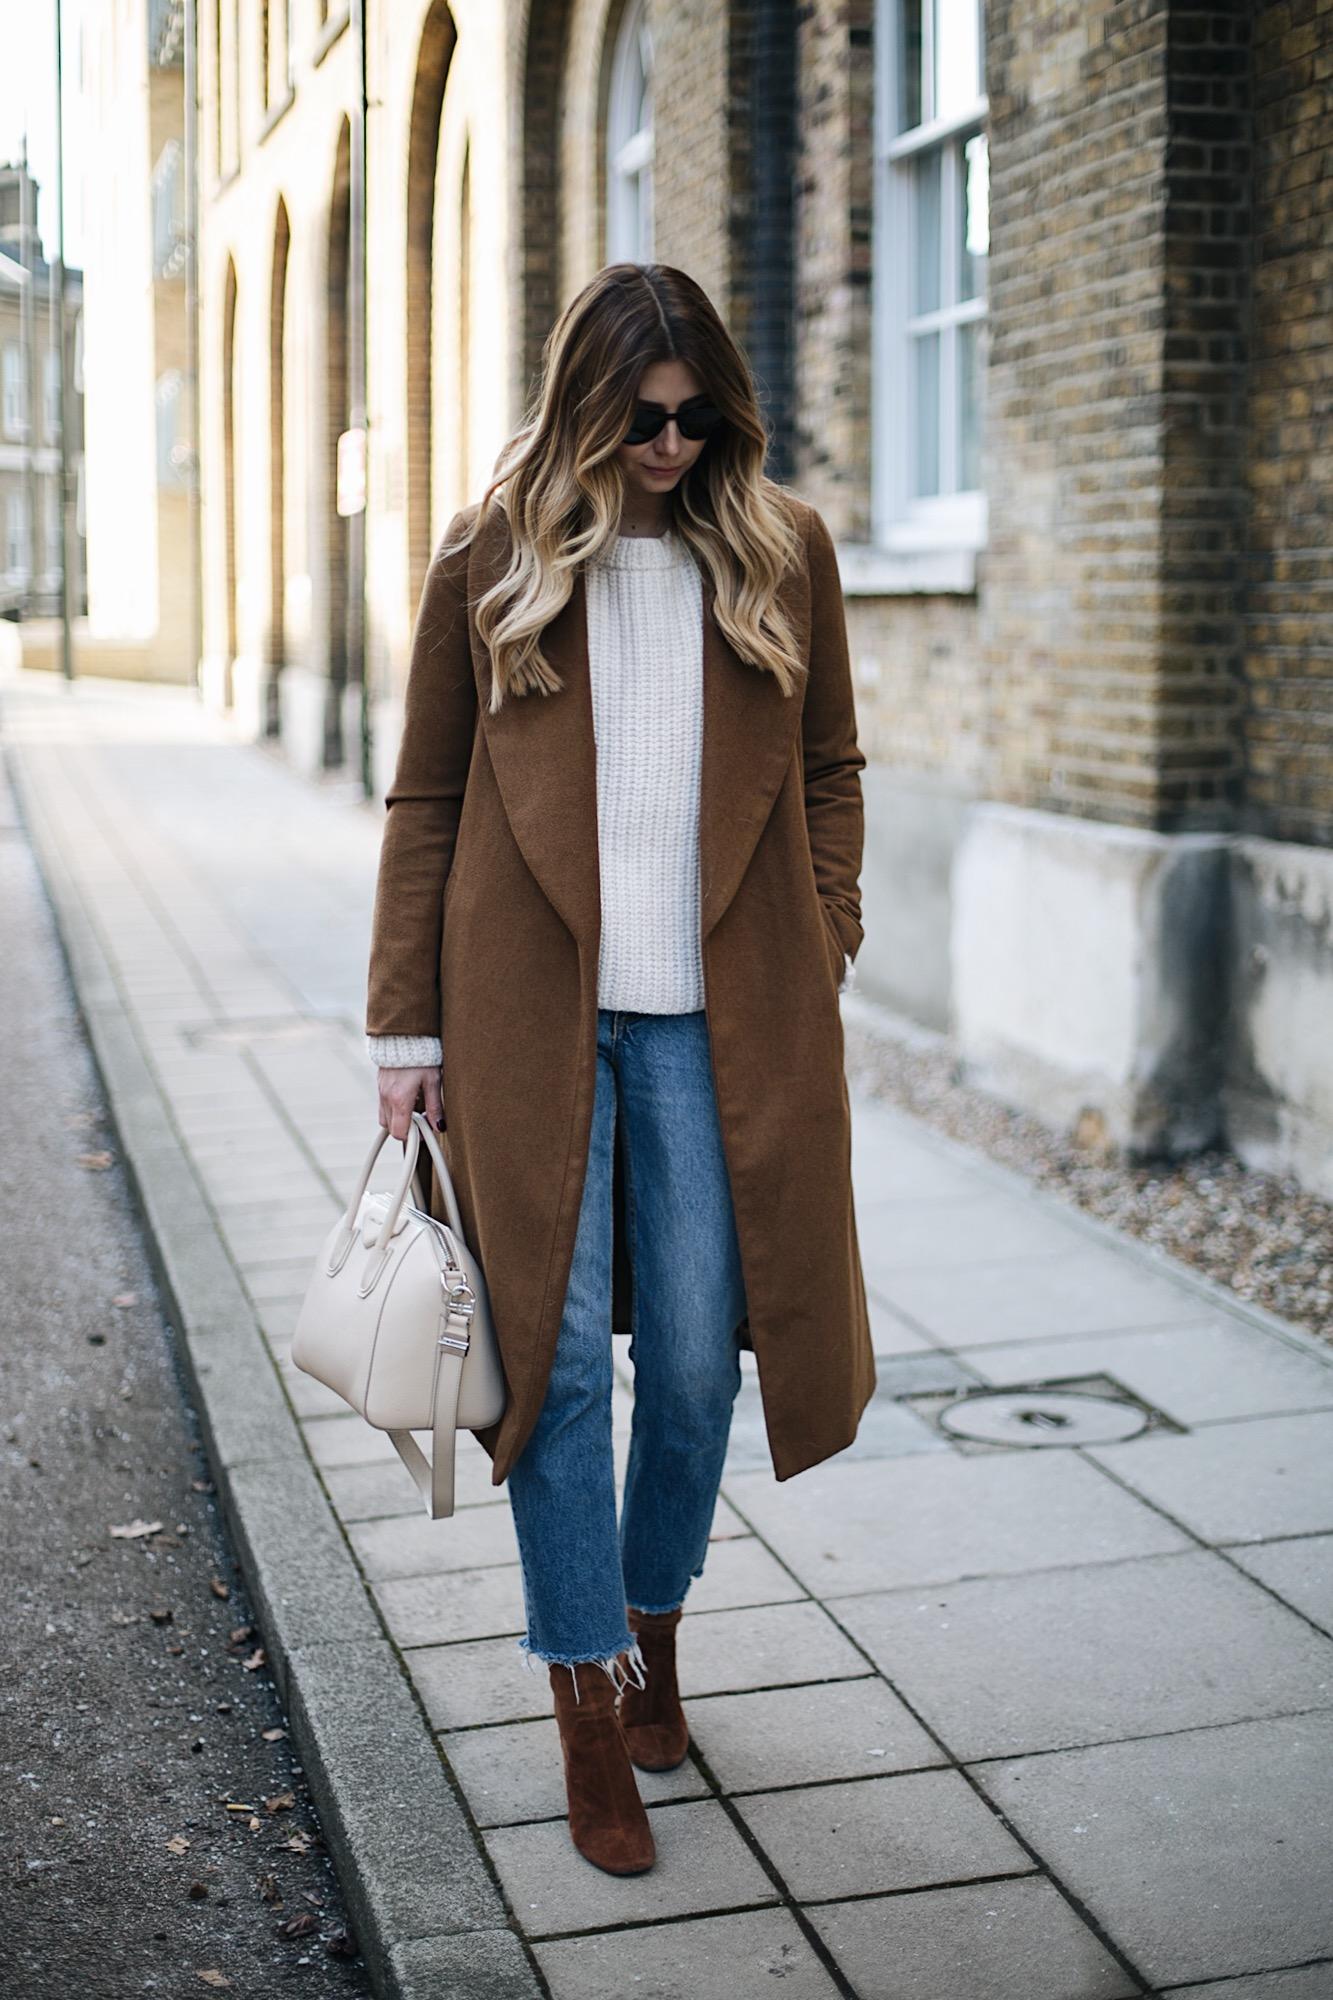 Tan coat, cream sweater raw hem jeans, tan suede boots, givenchy antigona bag